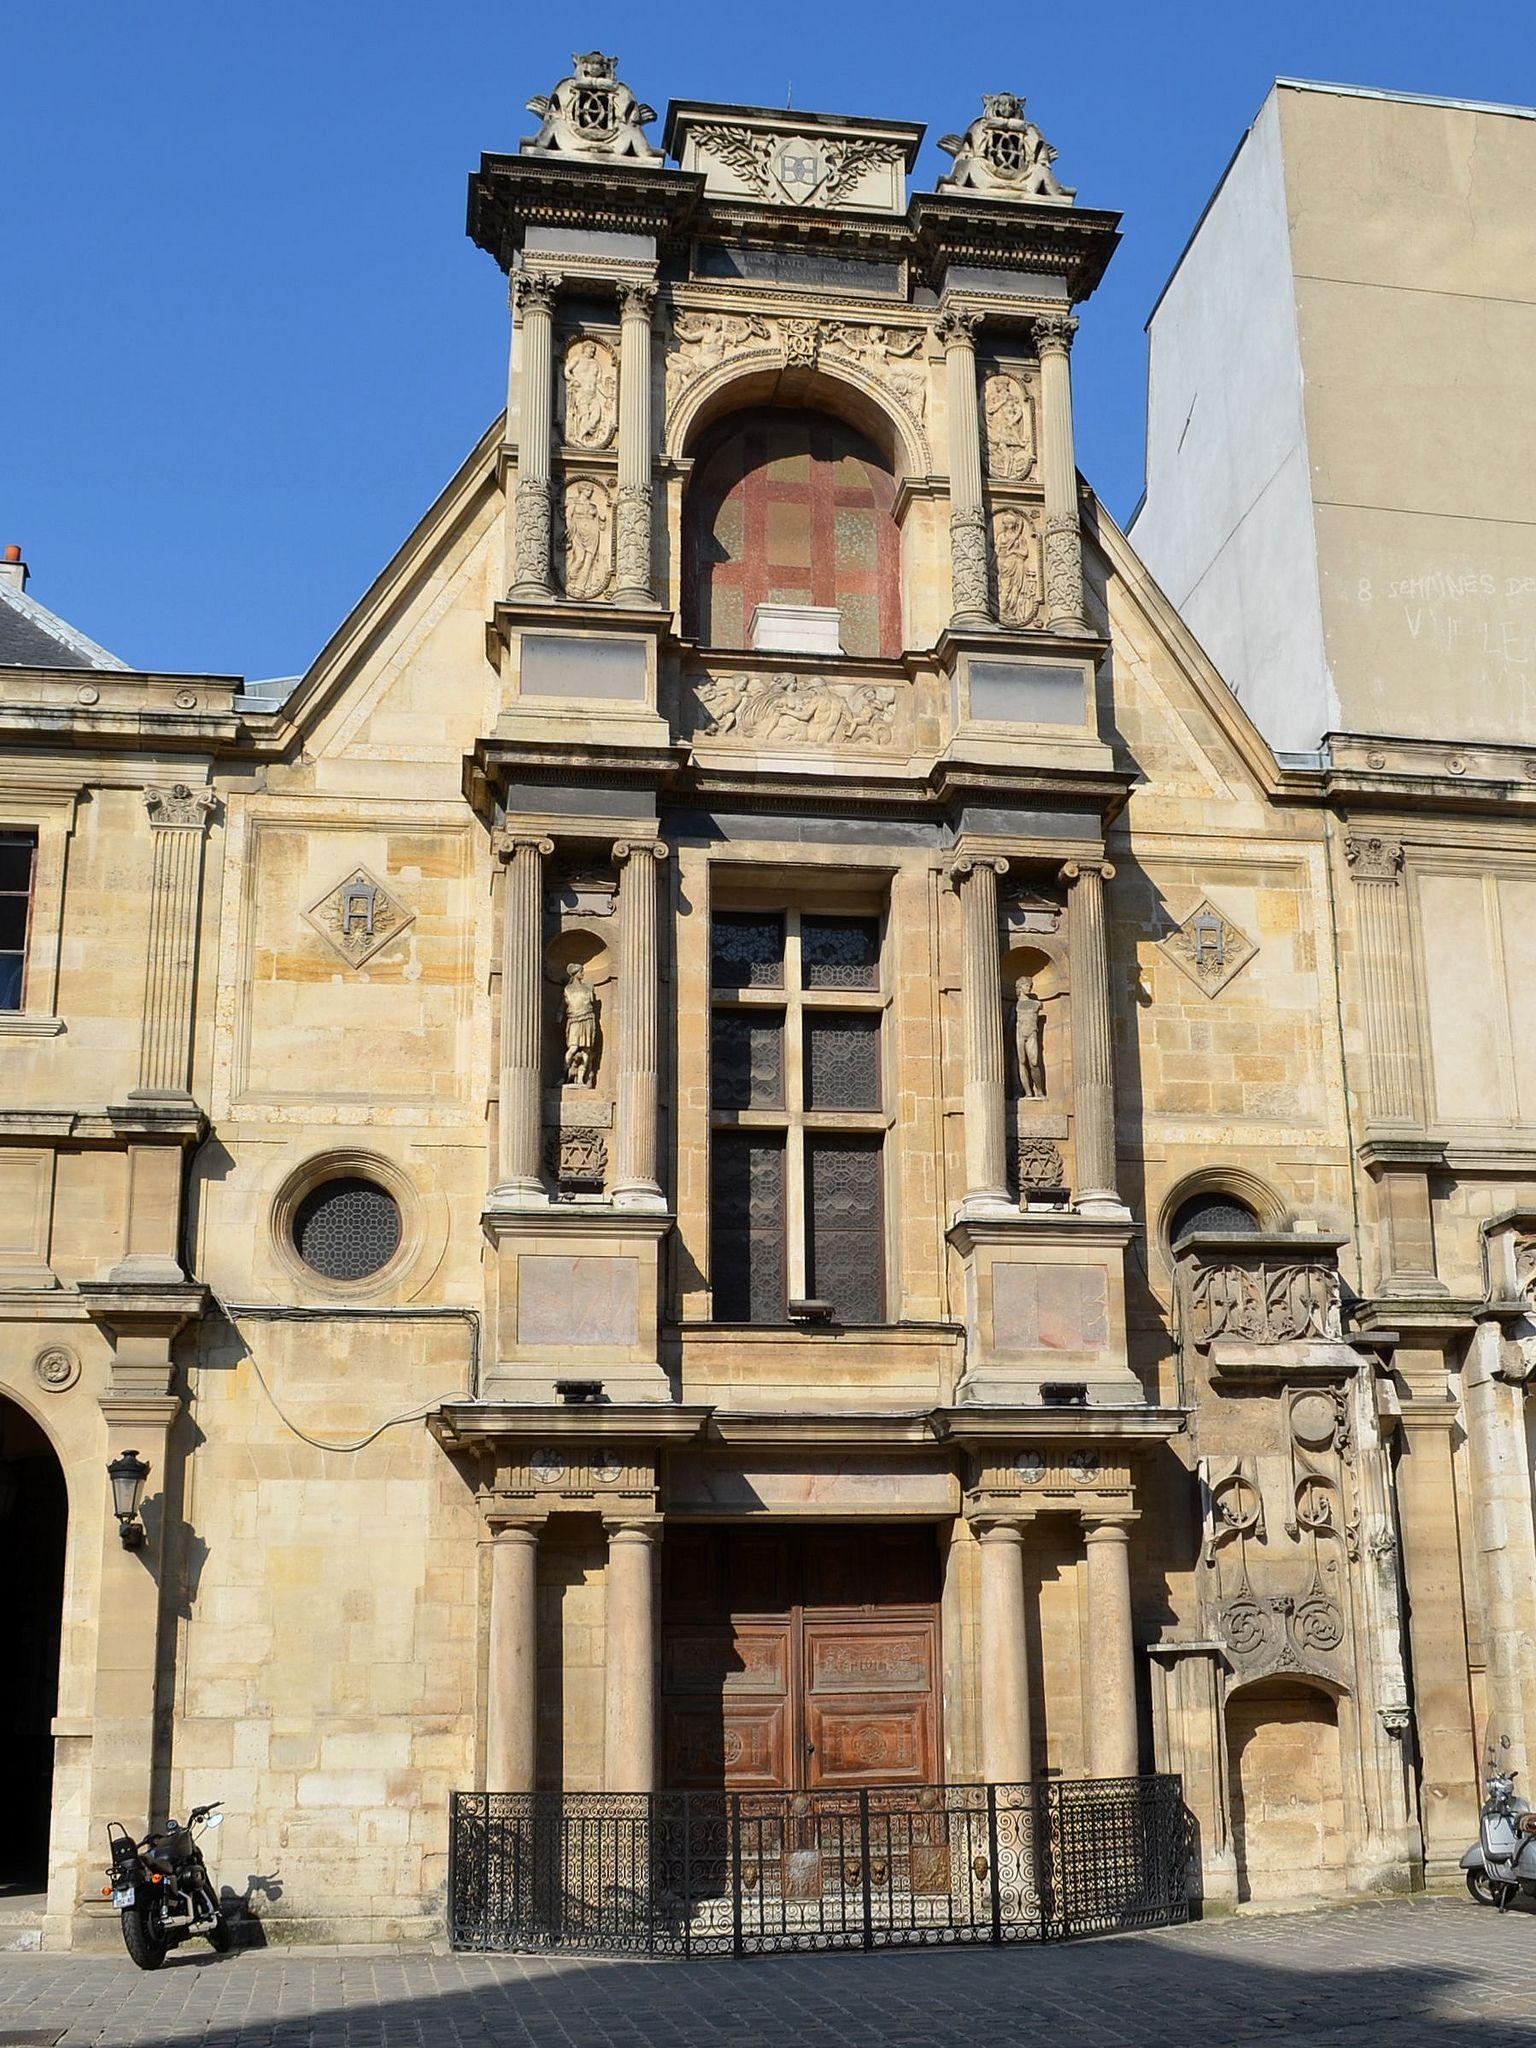 19th century france f lix jacques duban 1797 1870 ecole des beaux arts 1832 58 paris - Ecole des beaux arts paris ...